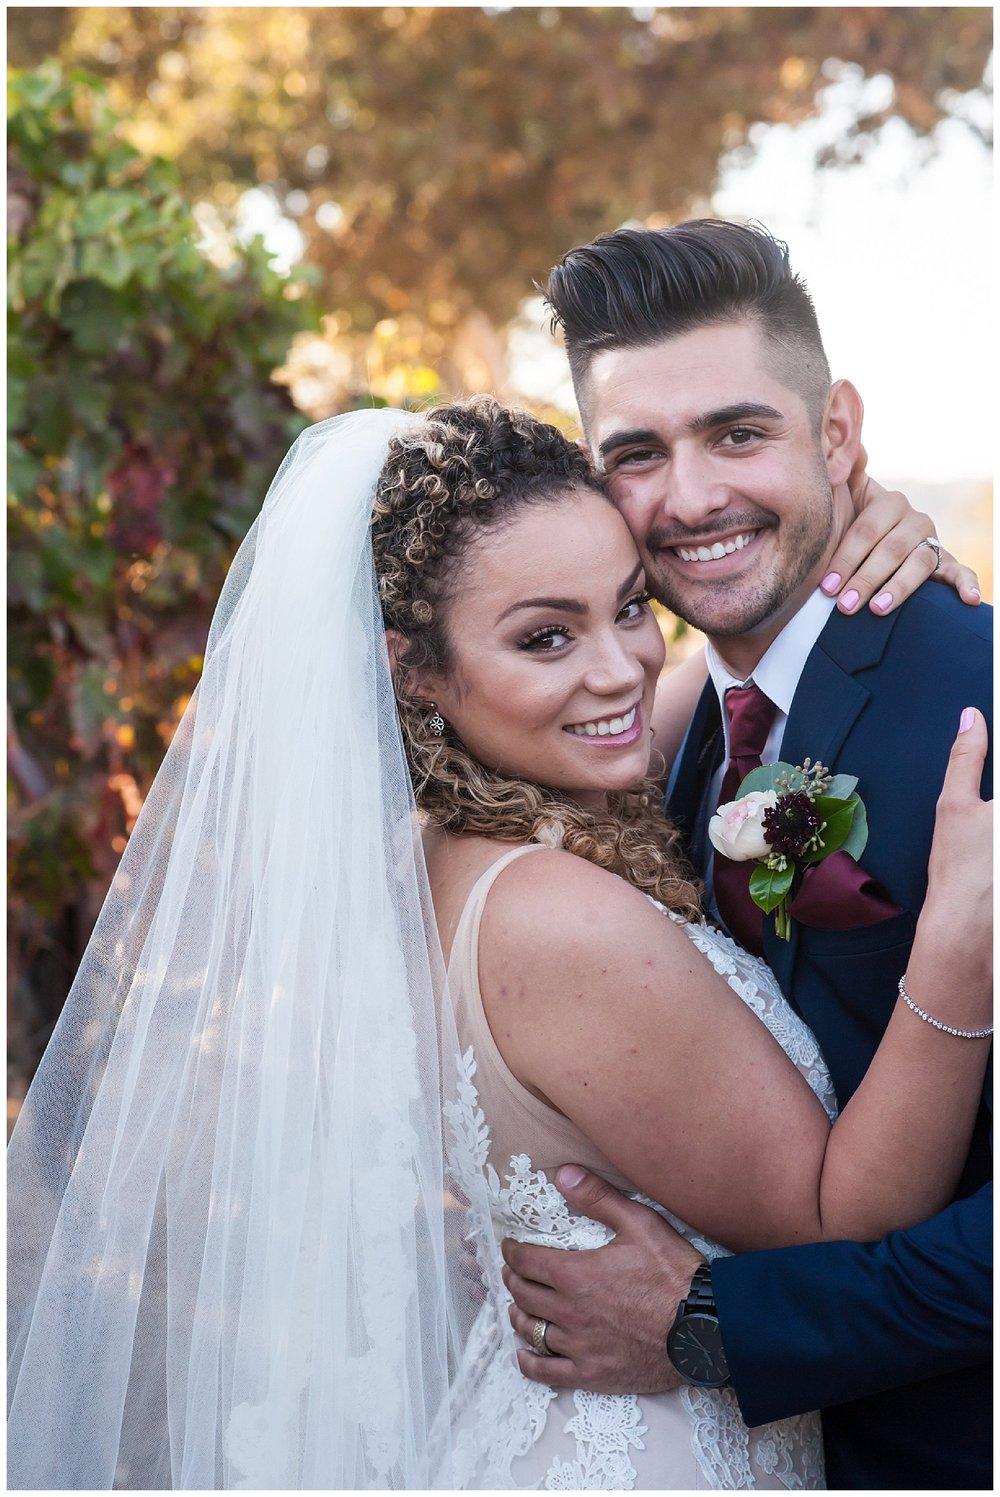 jen vasquez photography justin alexander couple